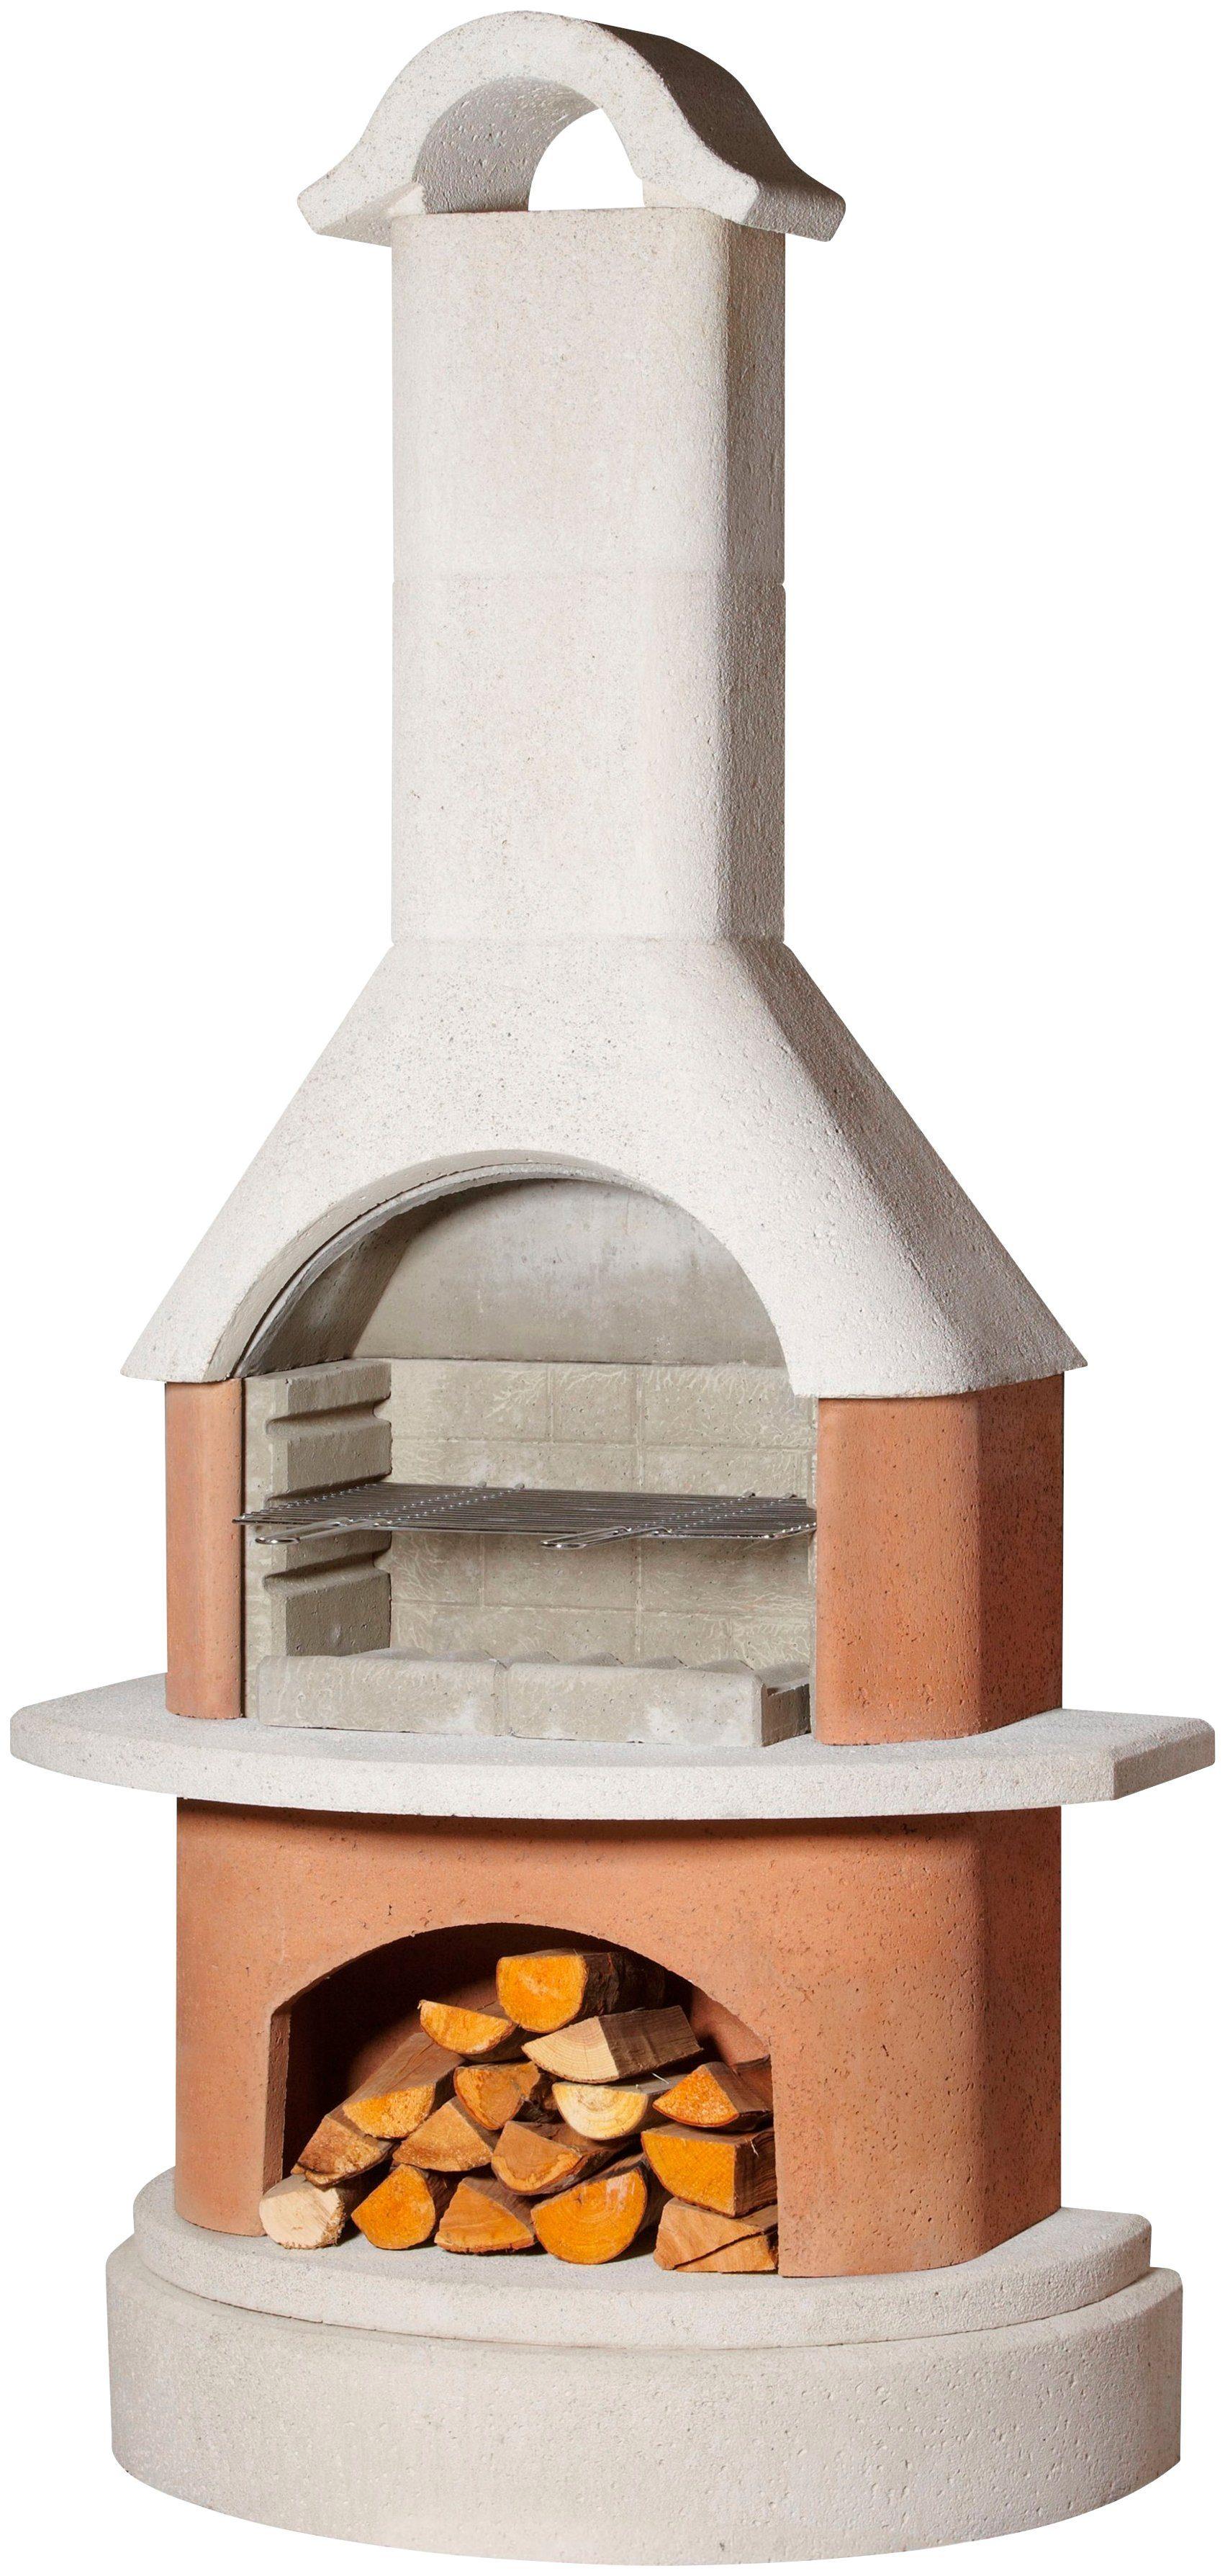 BUSCHBECK Grillkamin »Athen«, B/T/H: 110/65/230 cm, weiß/terrakotta